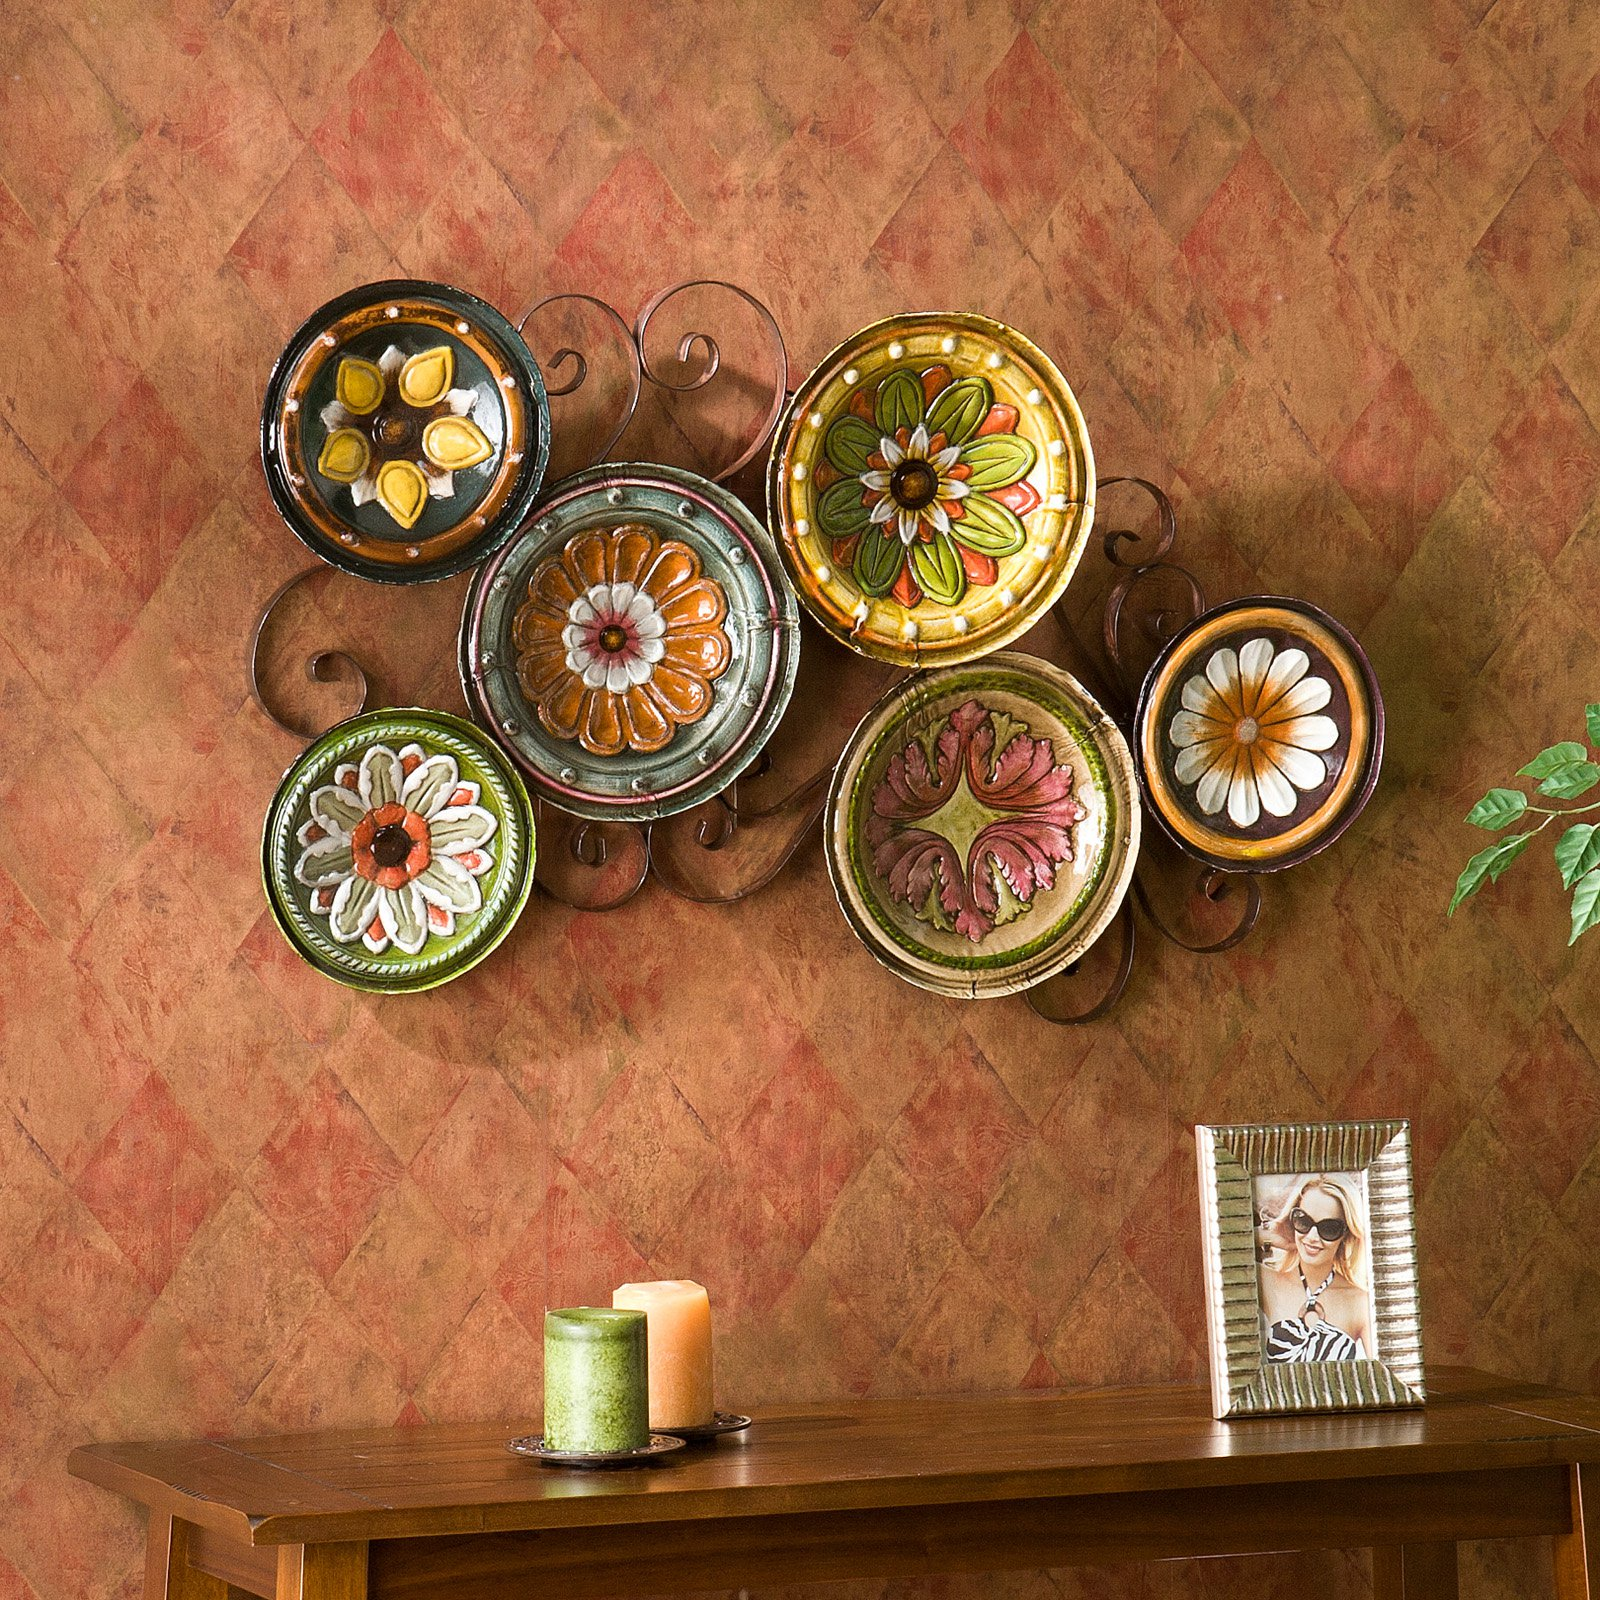 southern enterprises milan italian plates wall art walmart com